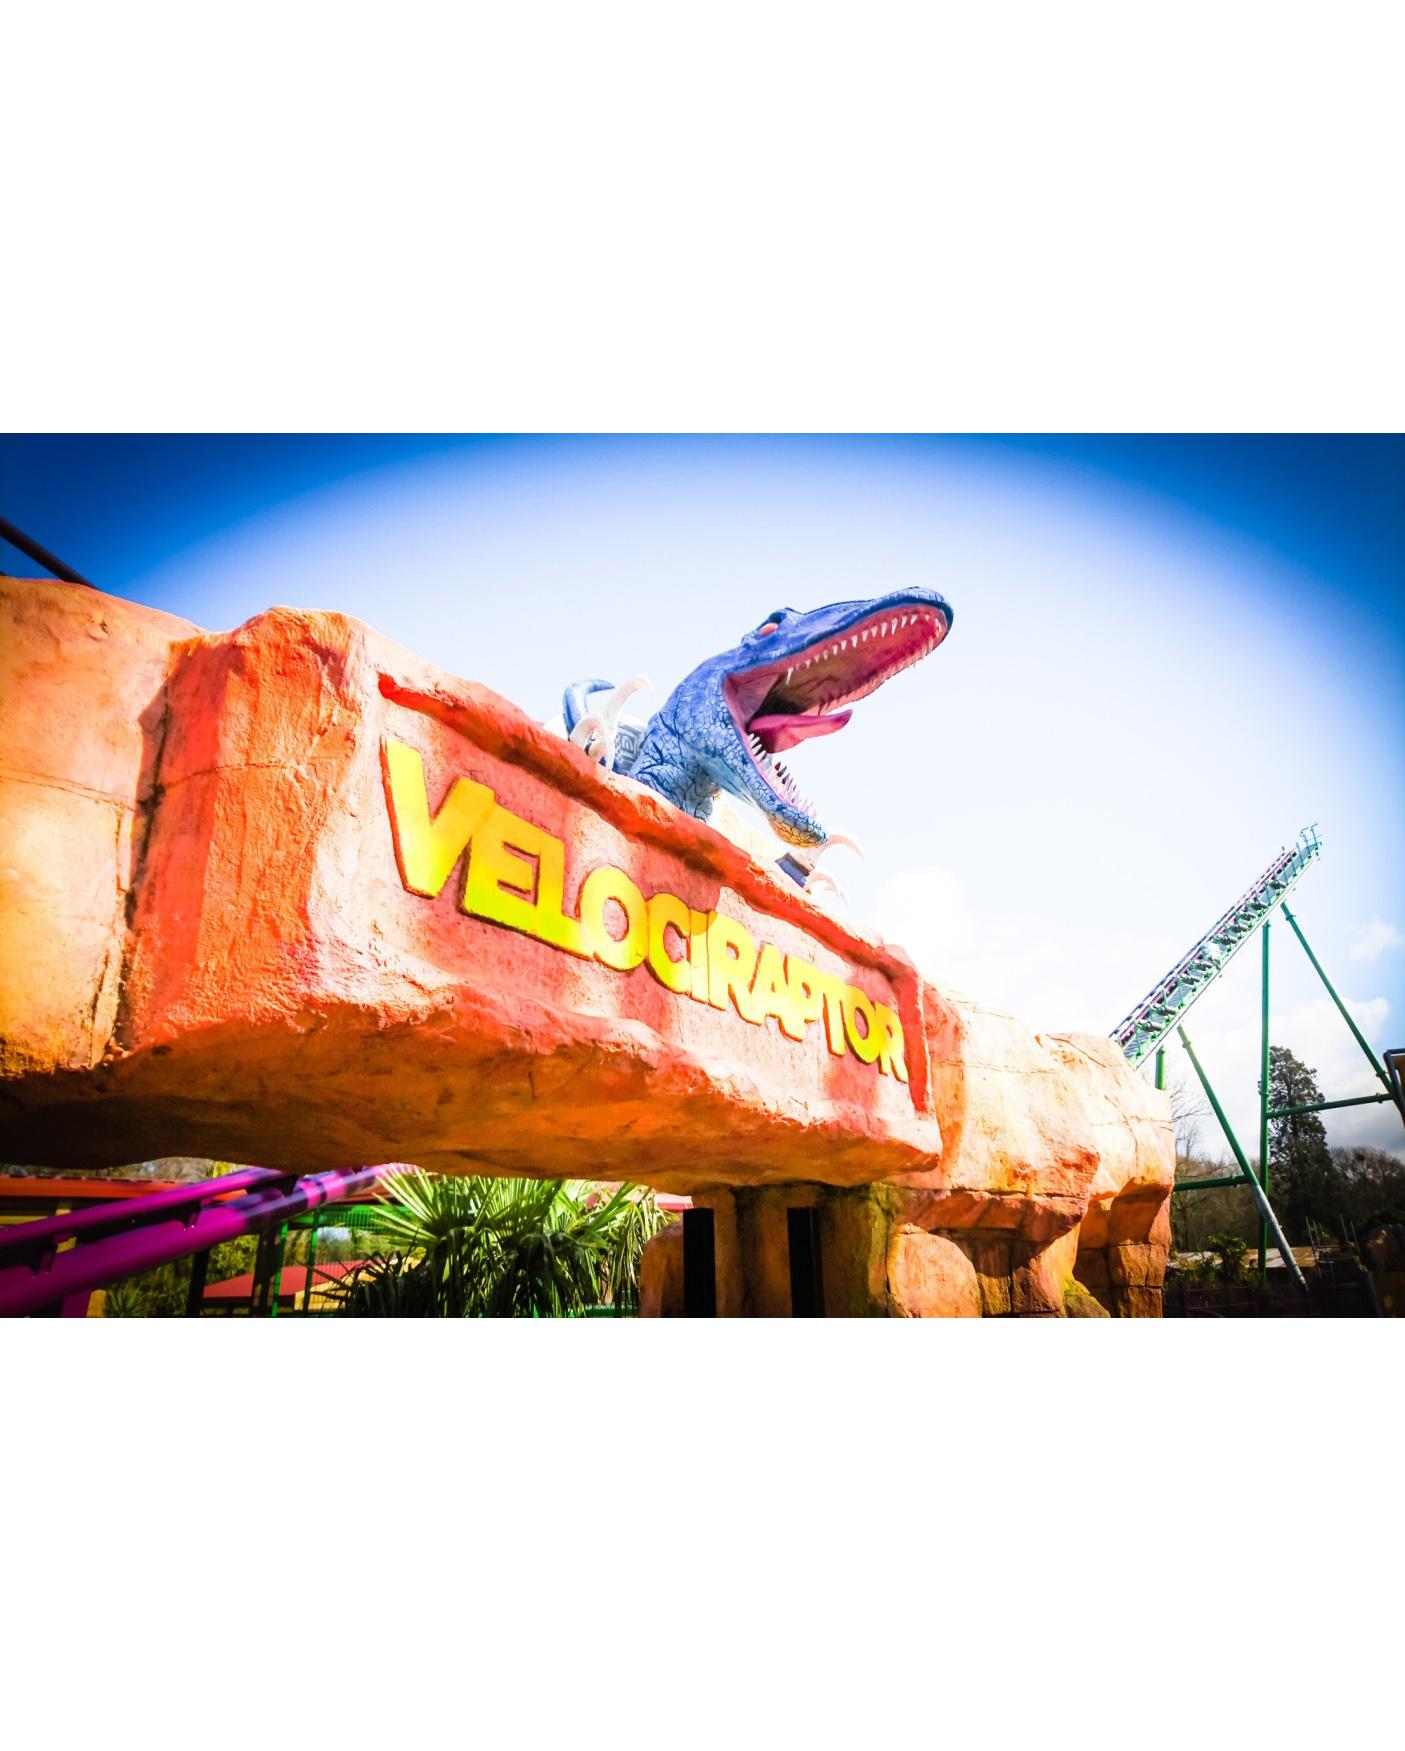 Velociraptor_enrance.jpg